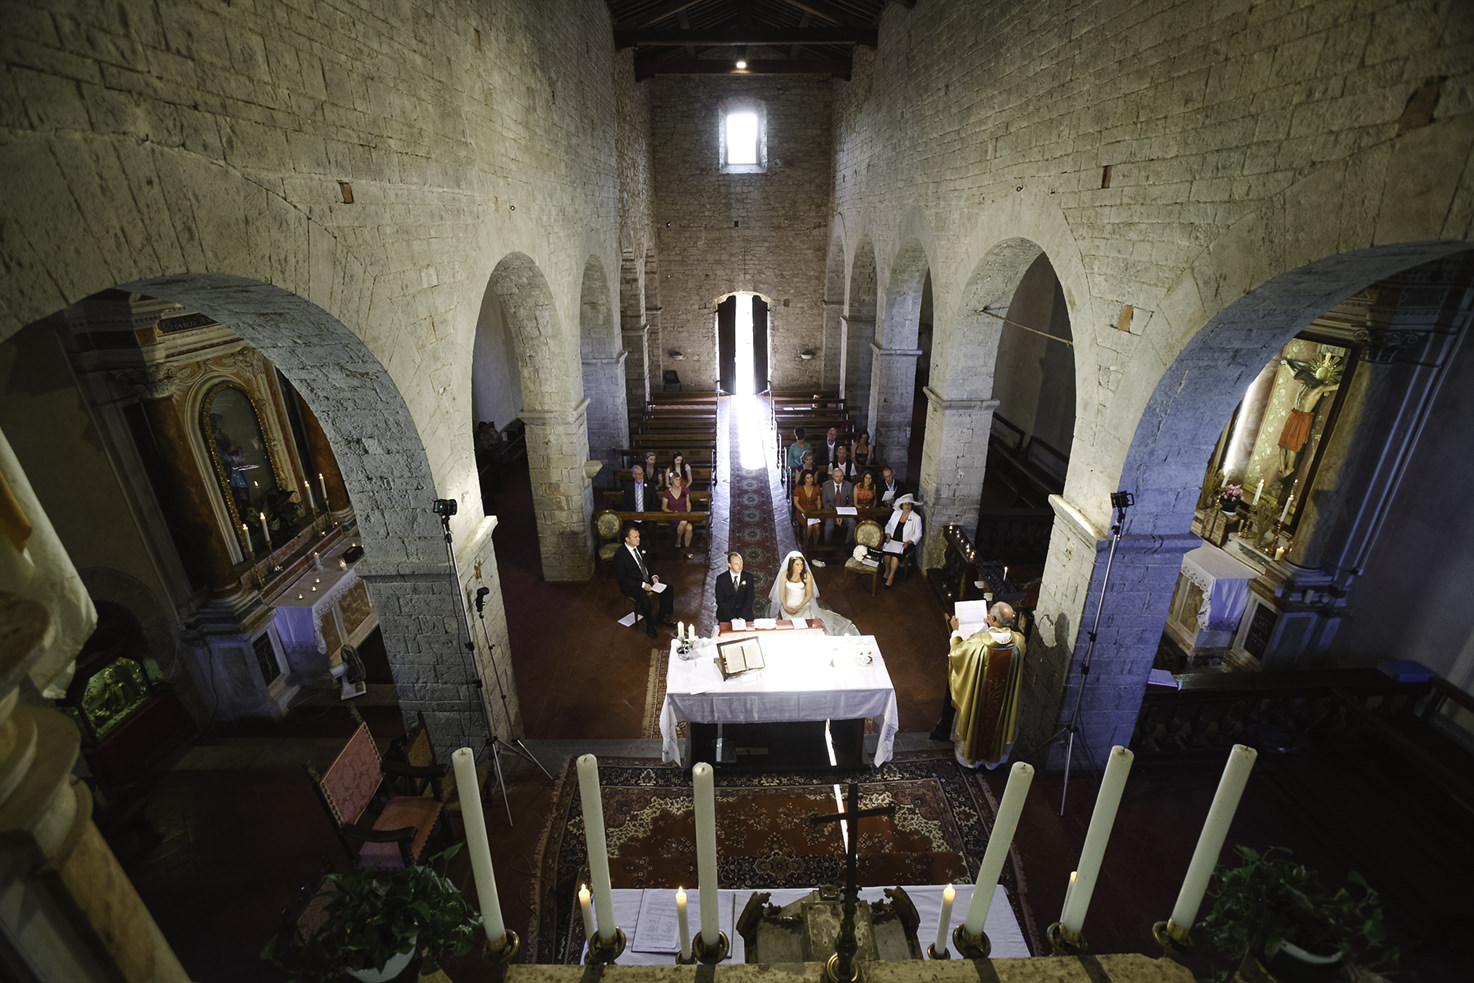 Catholic wedding at Pieve di Spaltenna